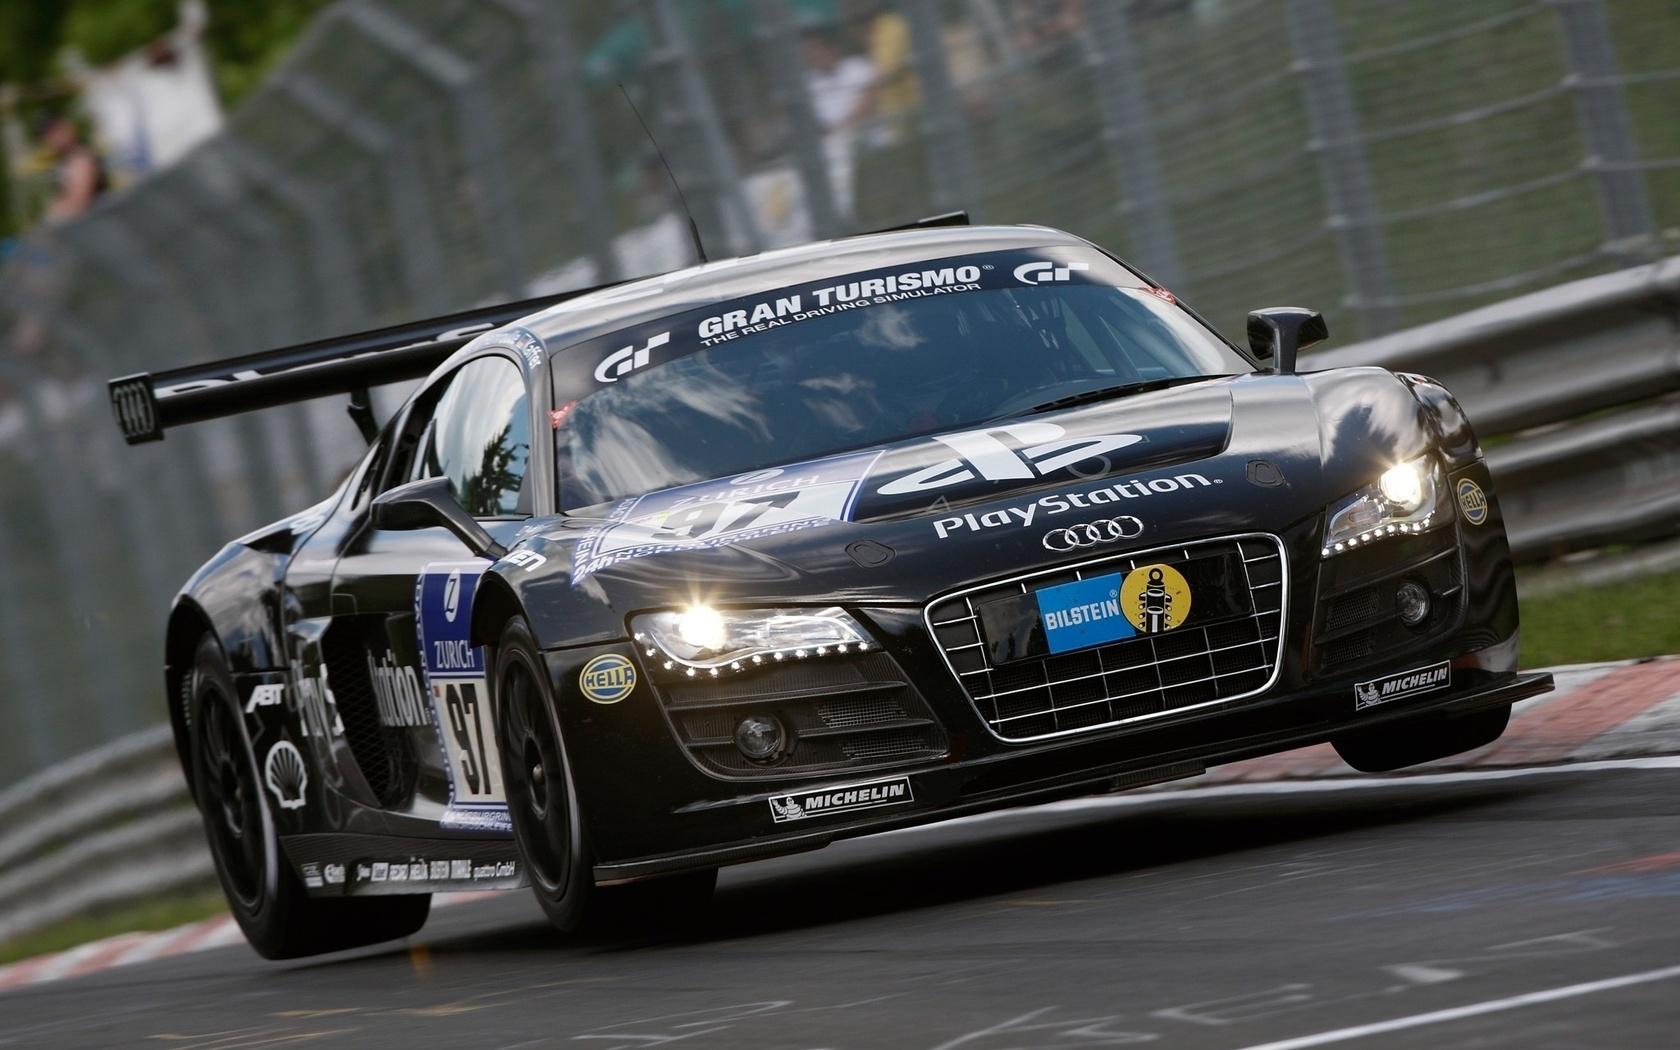 Wallpaper Audi R8 LMS Audi Sponsoren track Rennwagen groe 1680x1050